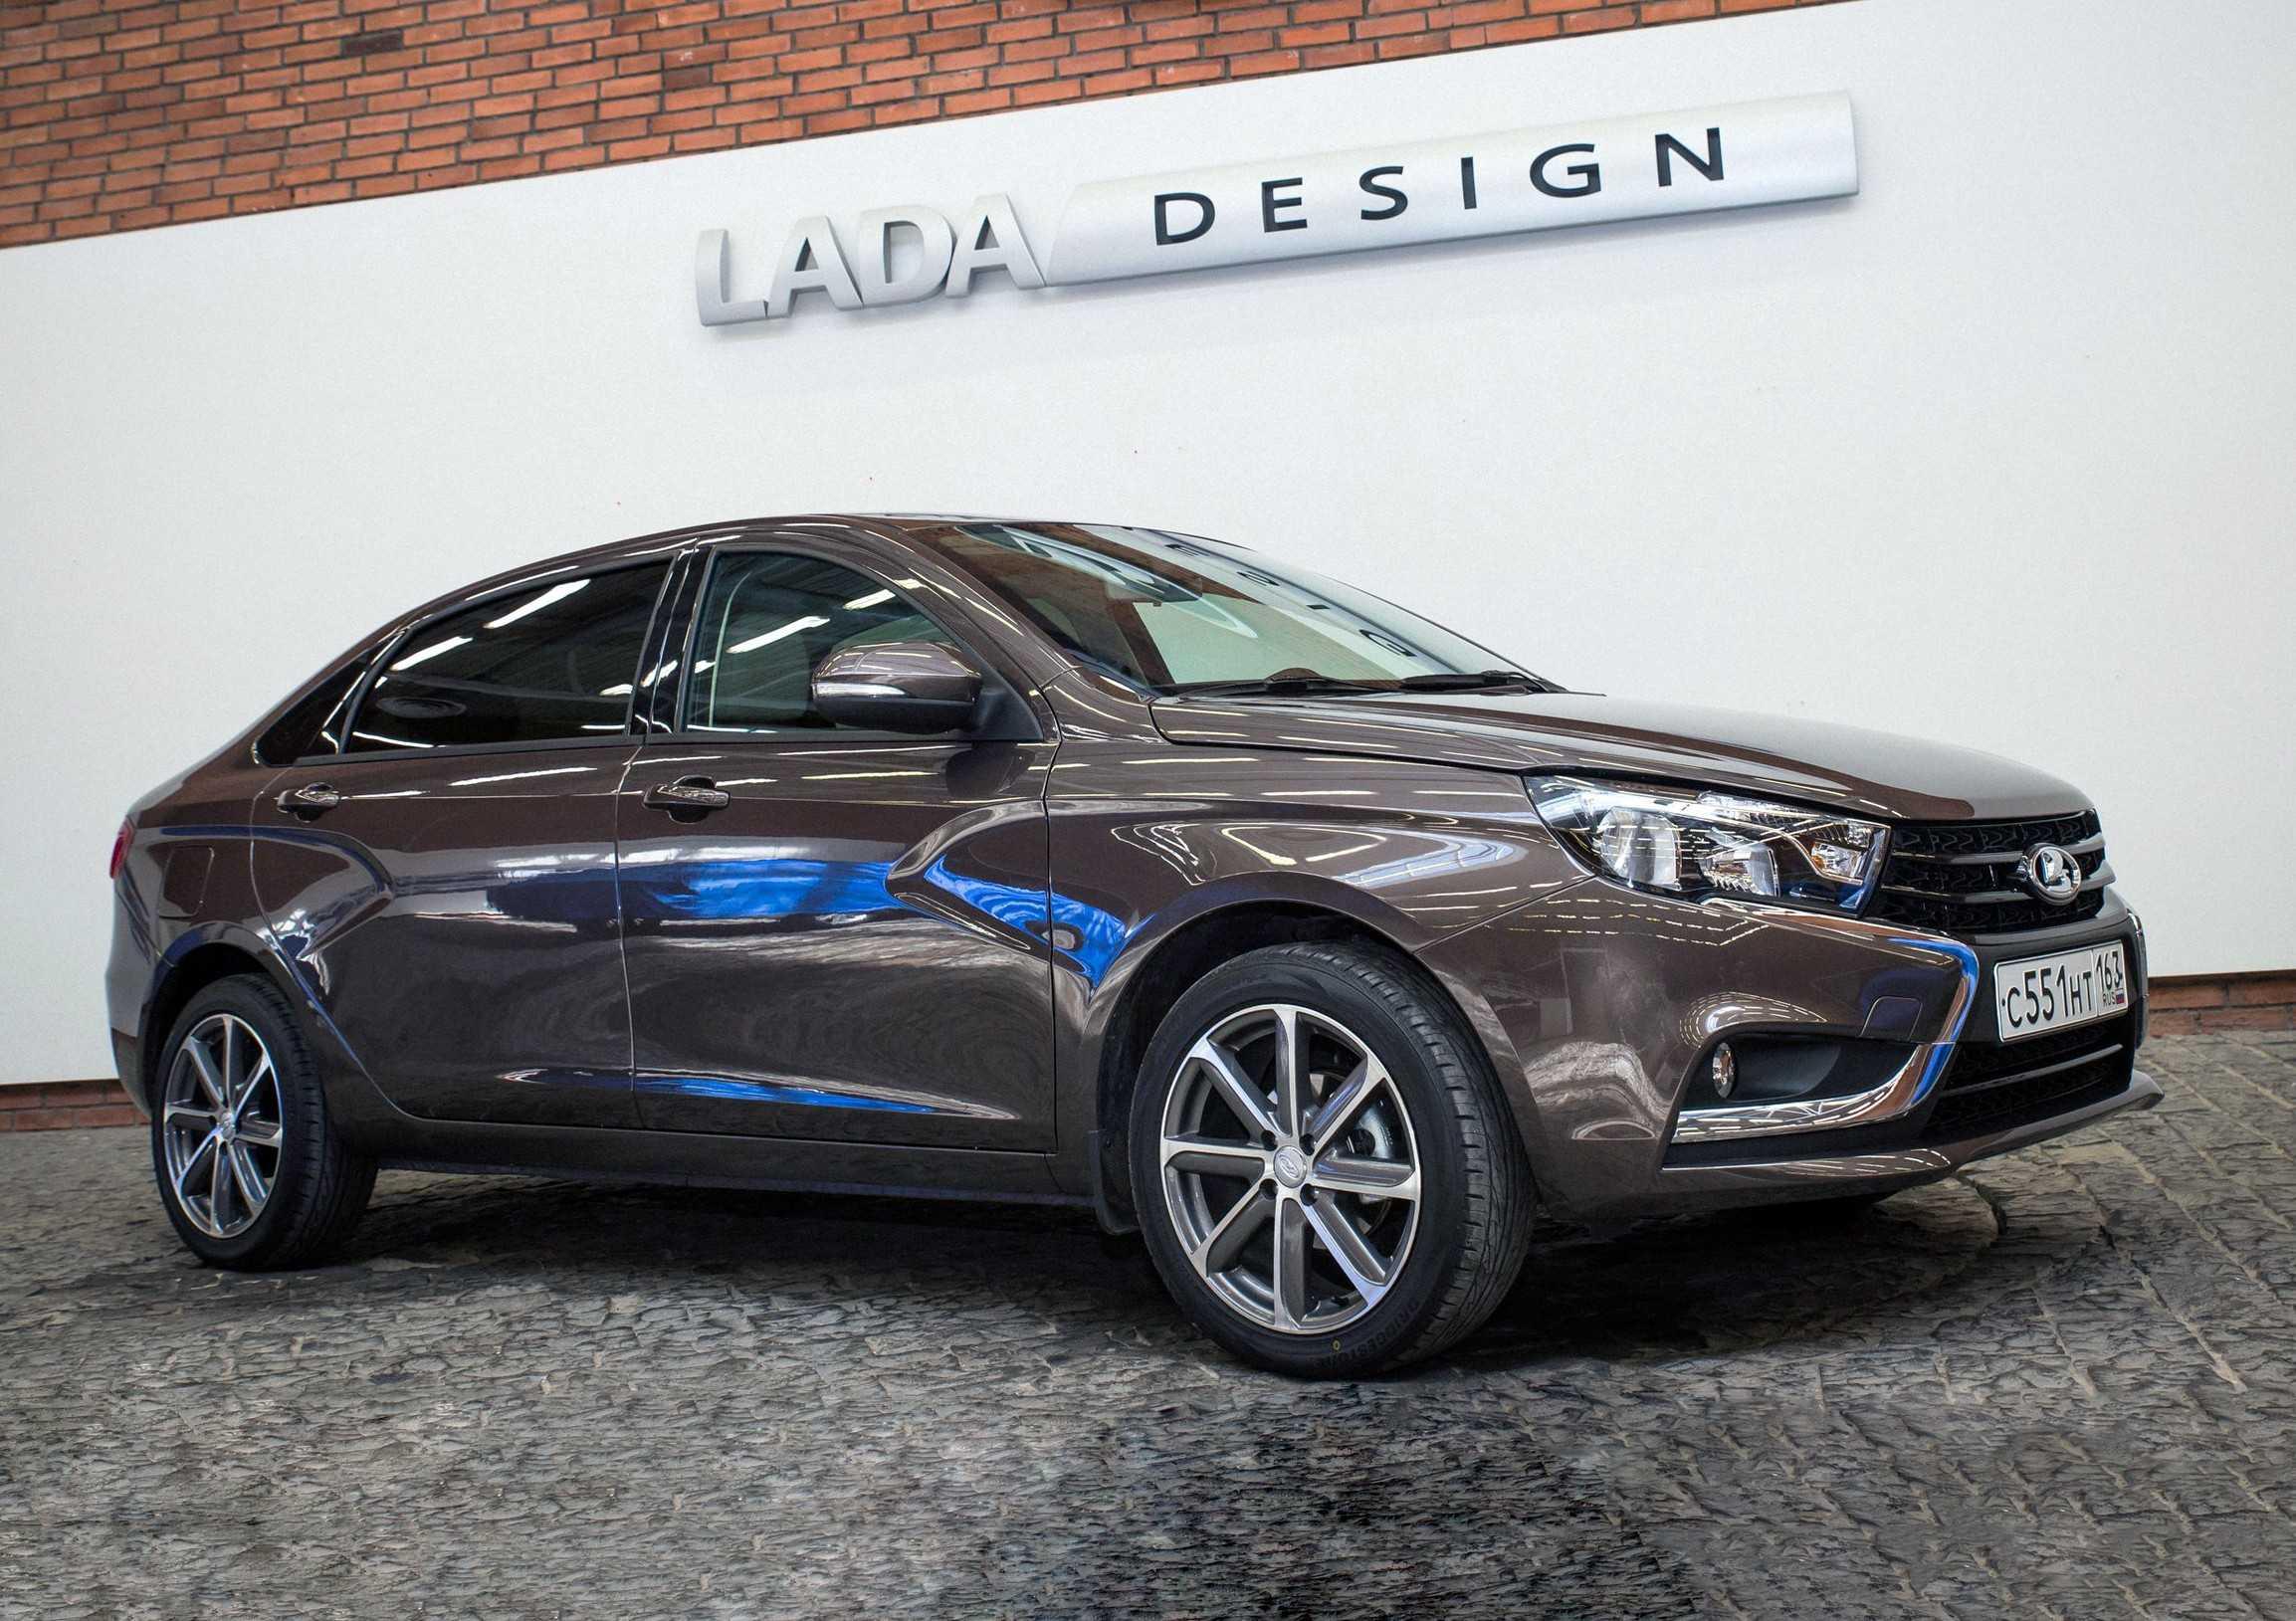 Лада Веста Сигнатур фото, видео, характеристики, цена Lada Vesta Signature